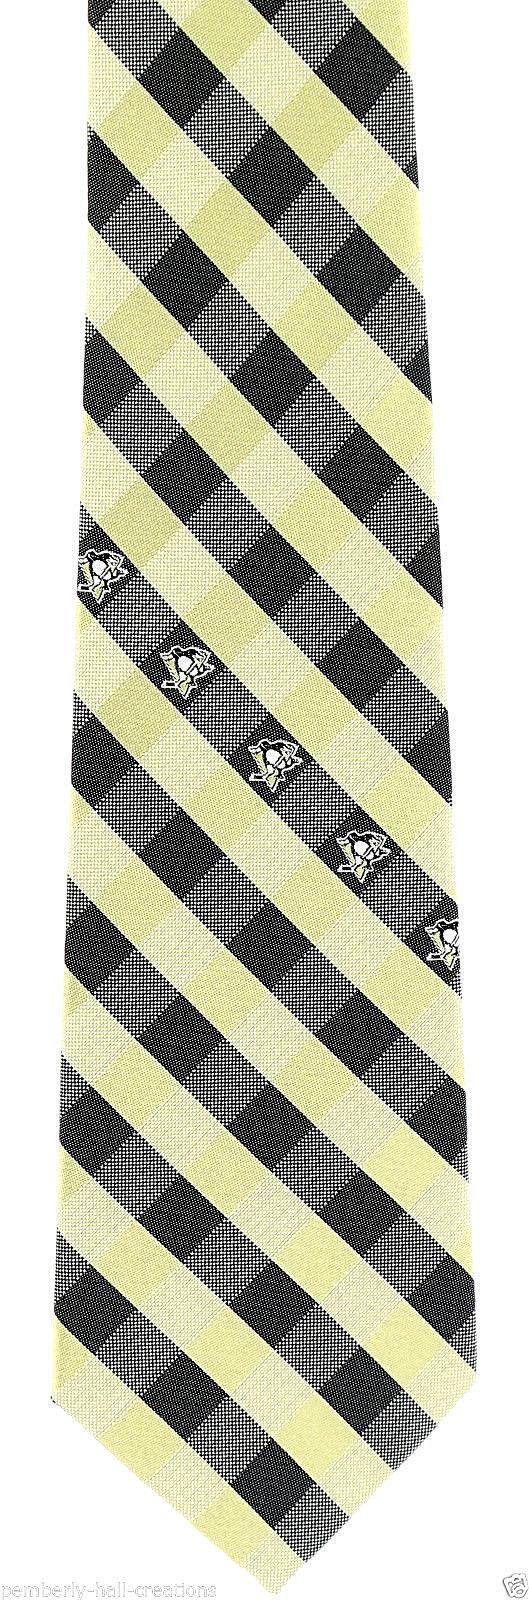 Pittsburgh Penguins Men's Necktie Licensed NHL Ice Hockey Checks Black Neck Tie